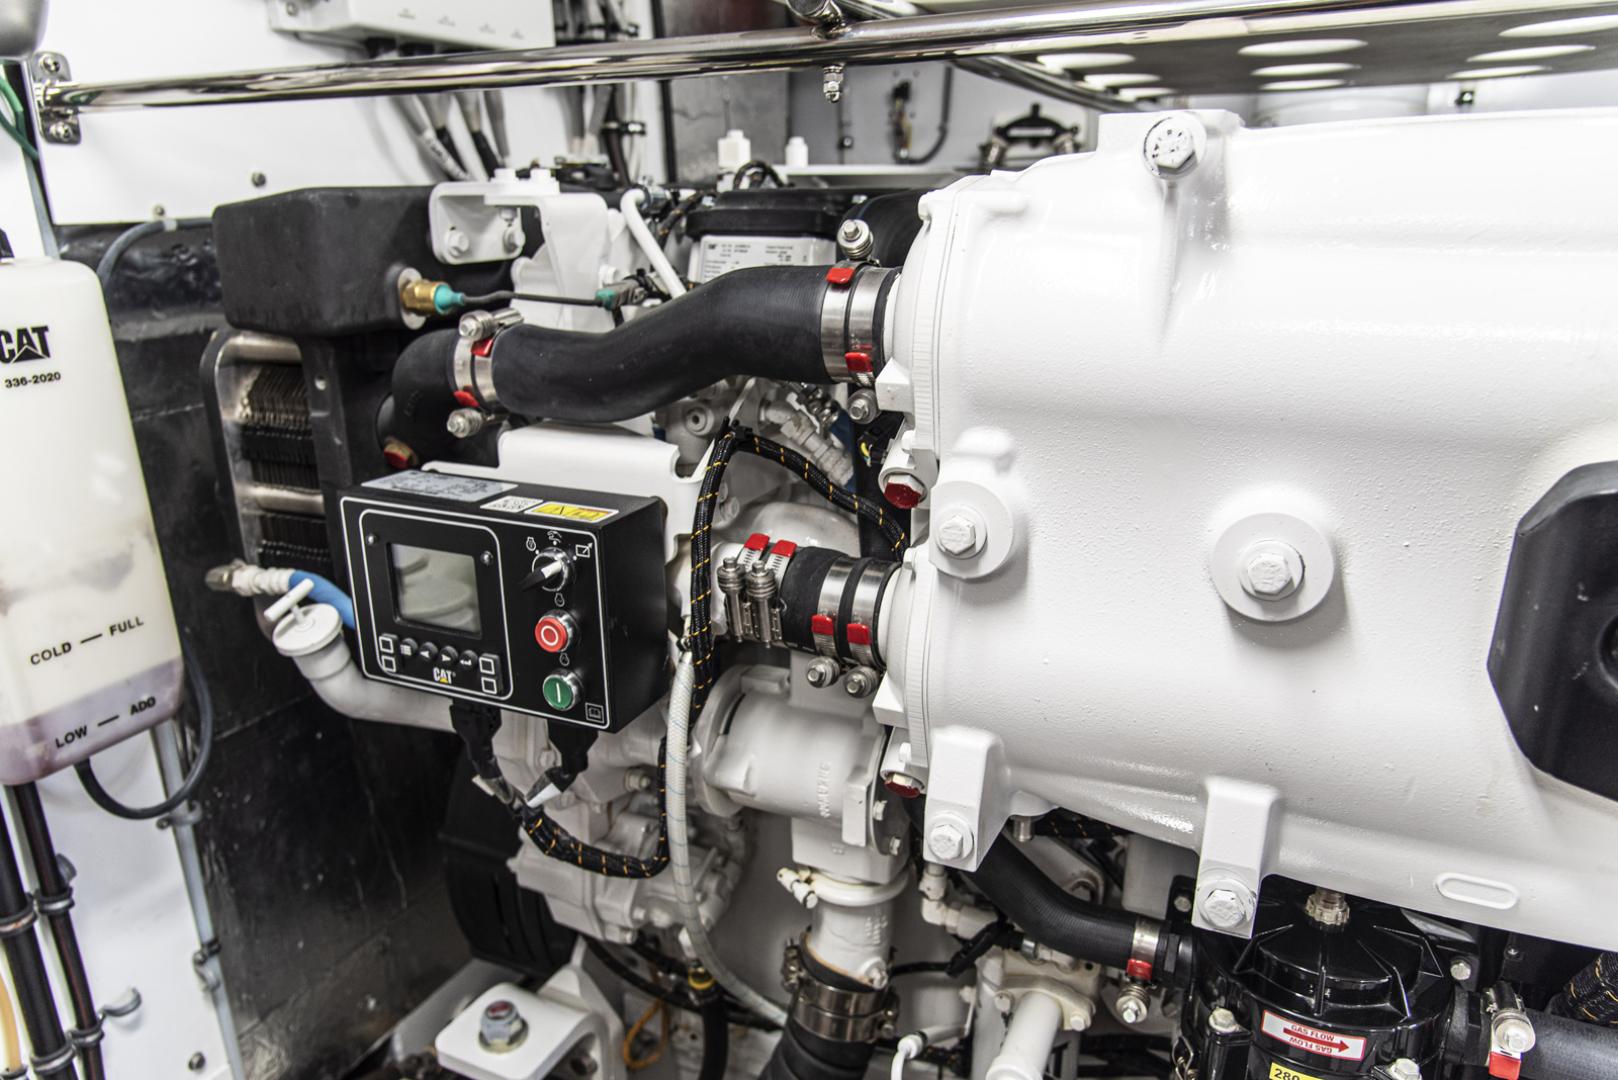 Neptunus-Motor Yacht Express 2018-LIQUID WISDOM Grand Haven-Michigan-United States-Stbd engine detail-1485027 | Thumbnail